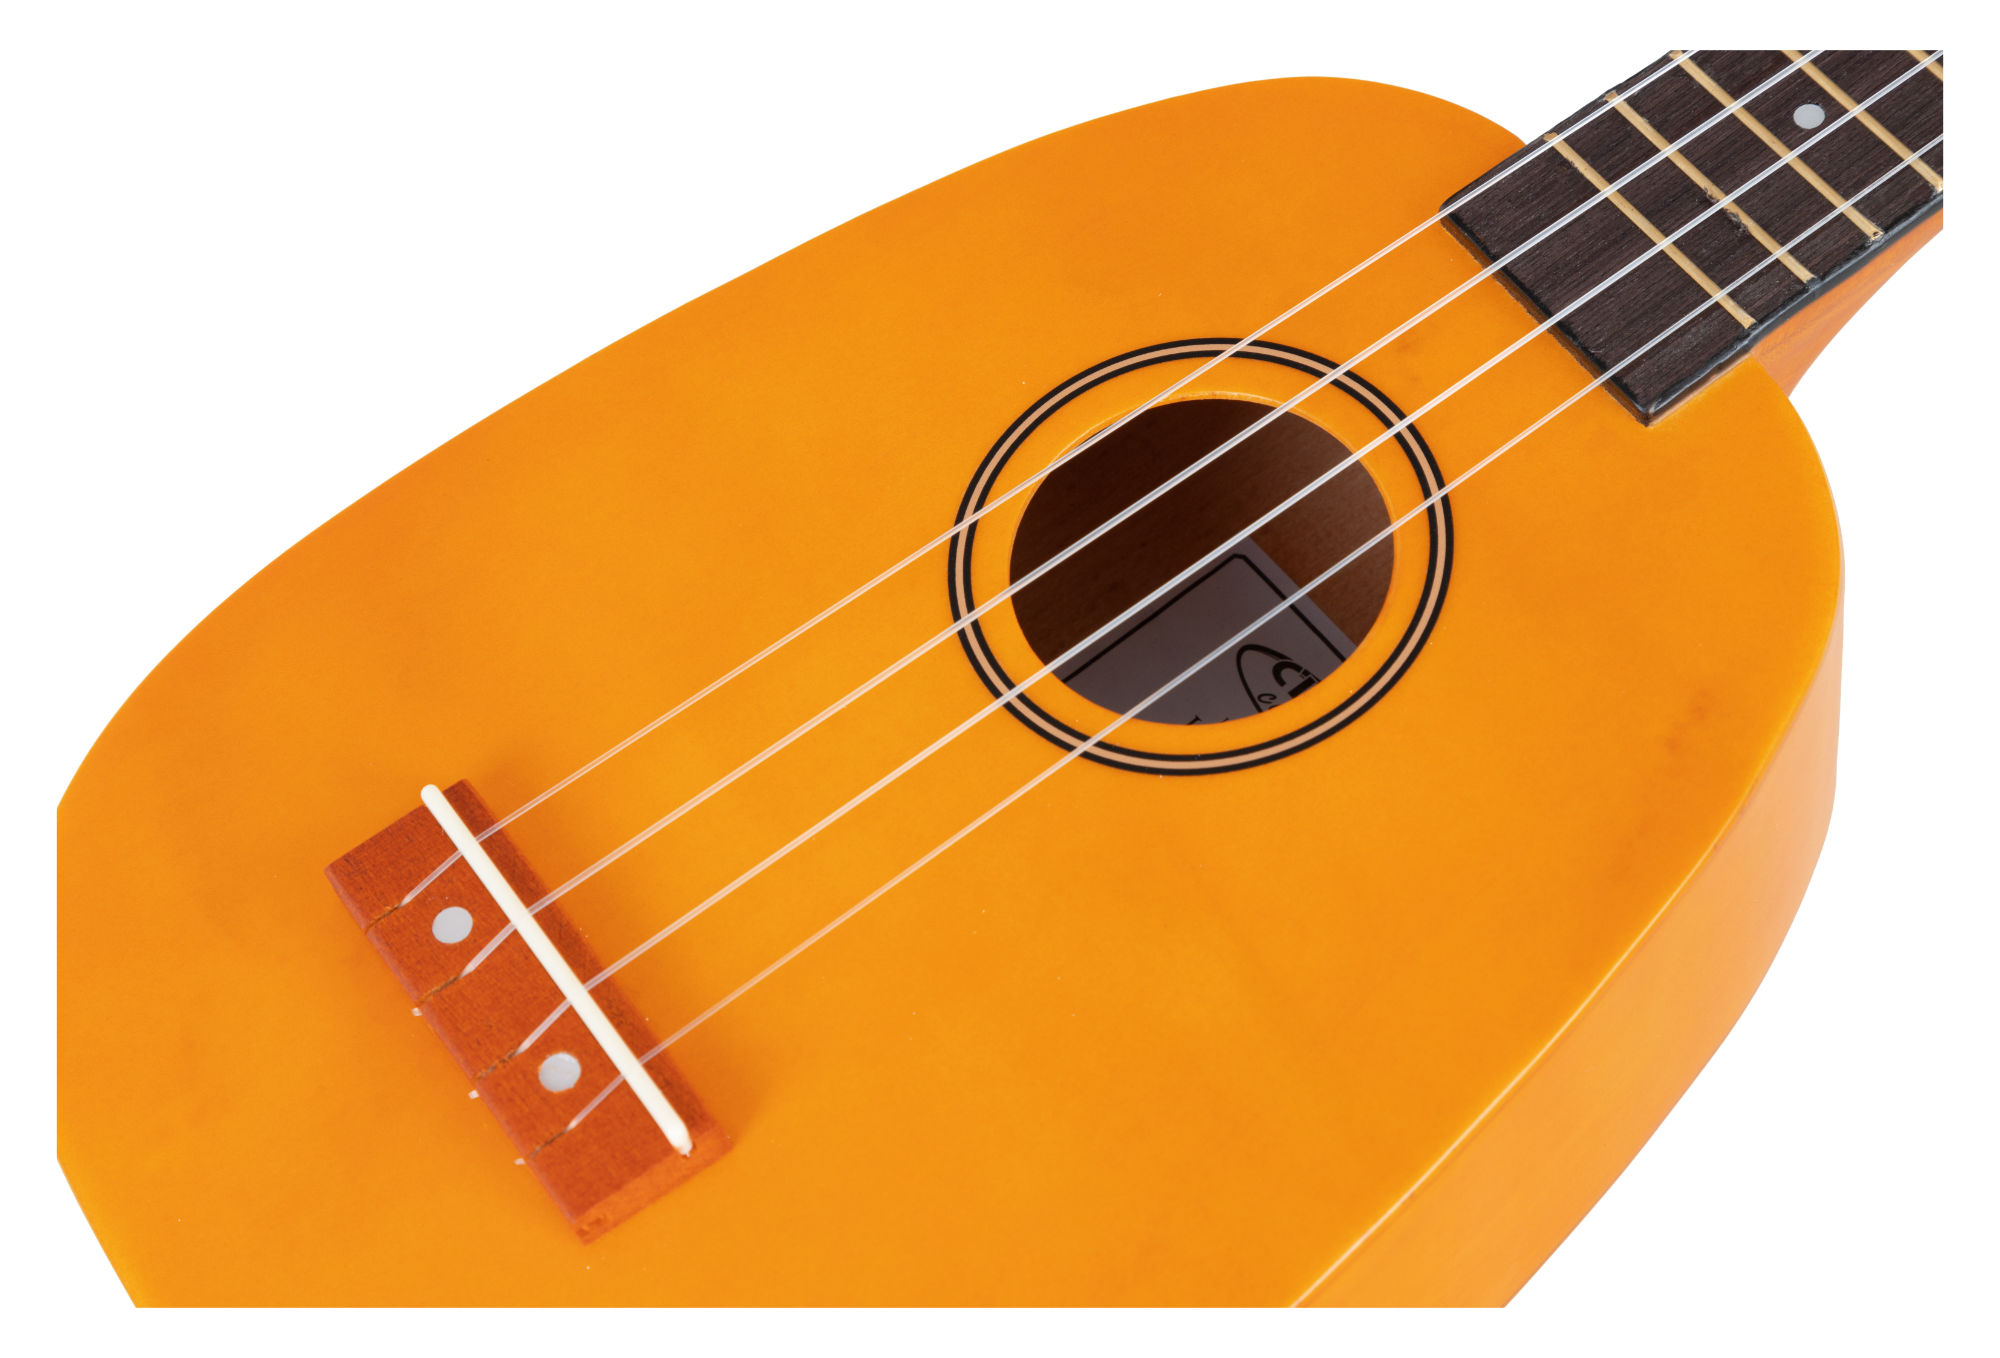 Musik & Instrumente CLASSIC CANTABILE US-100P NAT SOPRAN UKULELE PINEAPPLE NYLON SAITEN GELB